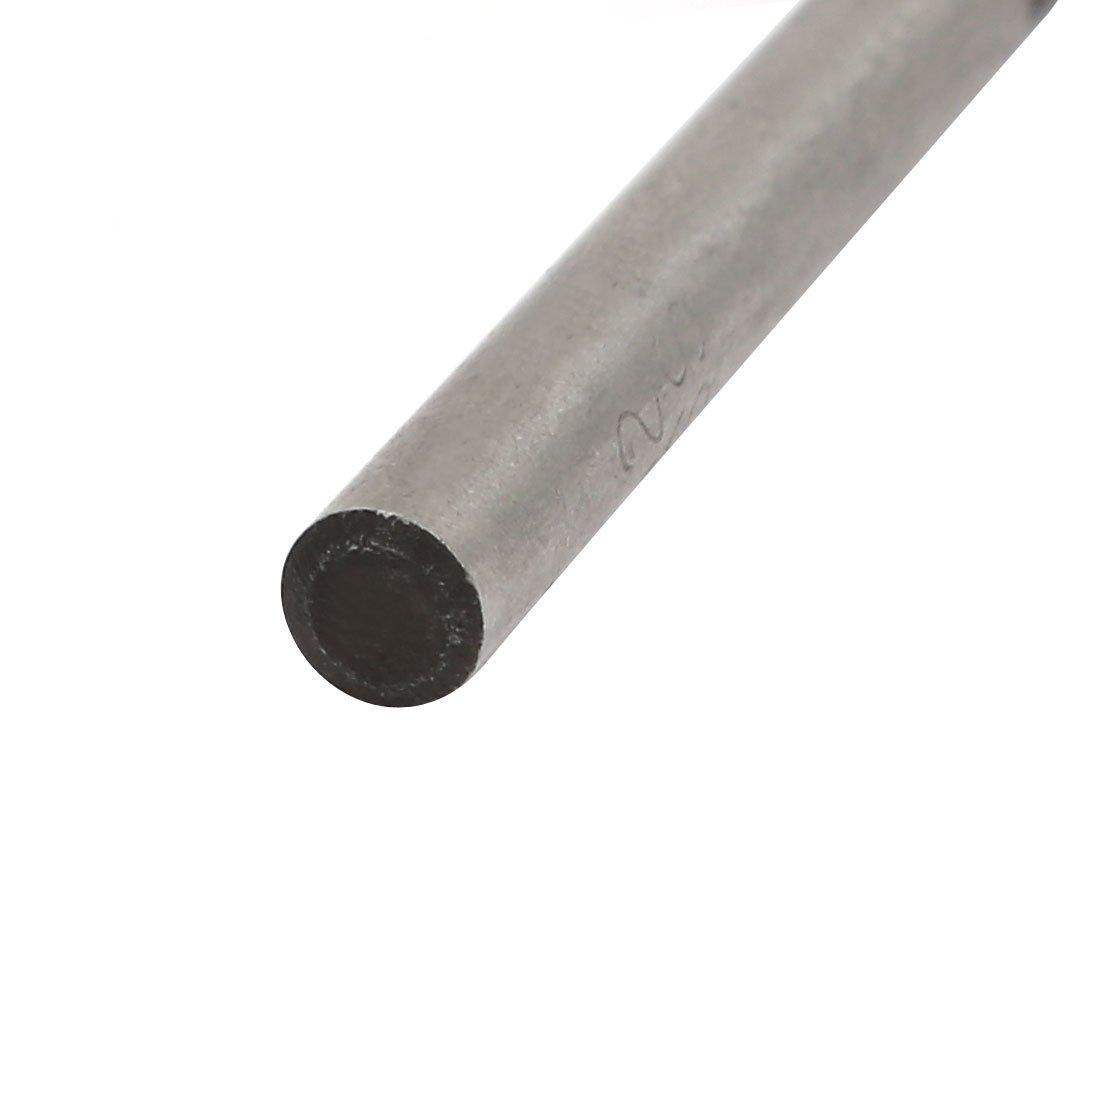 Almencla 5 Pieces M35 HSS Colbalt Drill Bits 7.2mm,